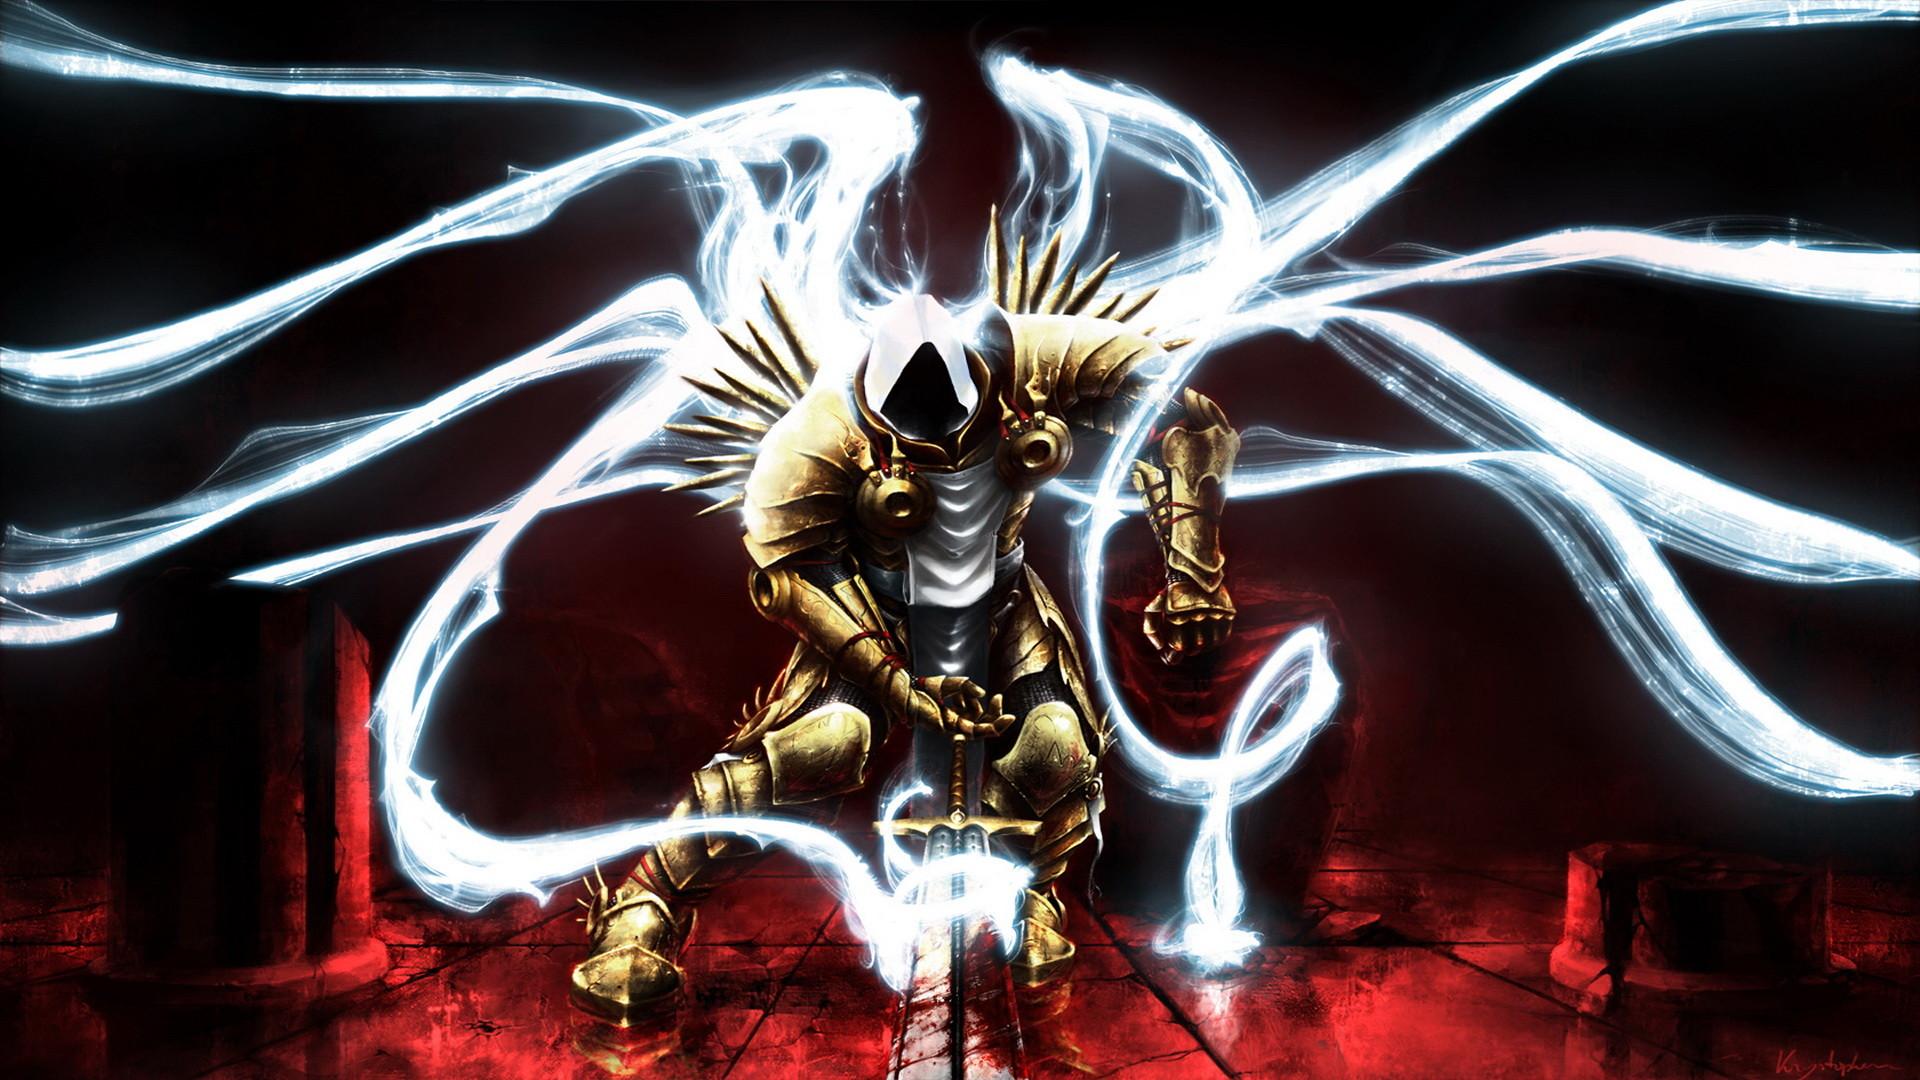 diablo iii archangel Wallpaper, PC Game Wallpapers, Game HD Wallpapers .